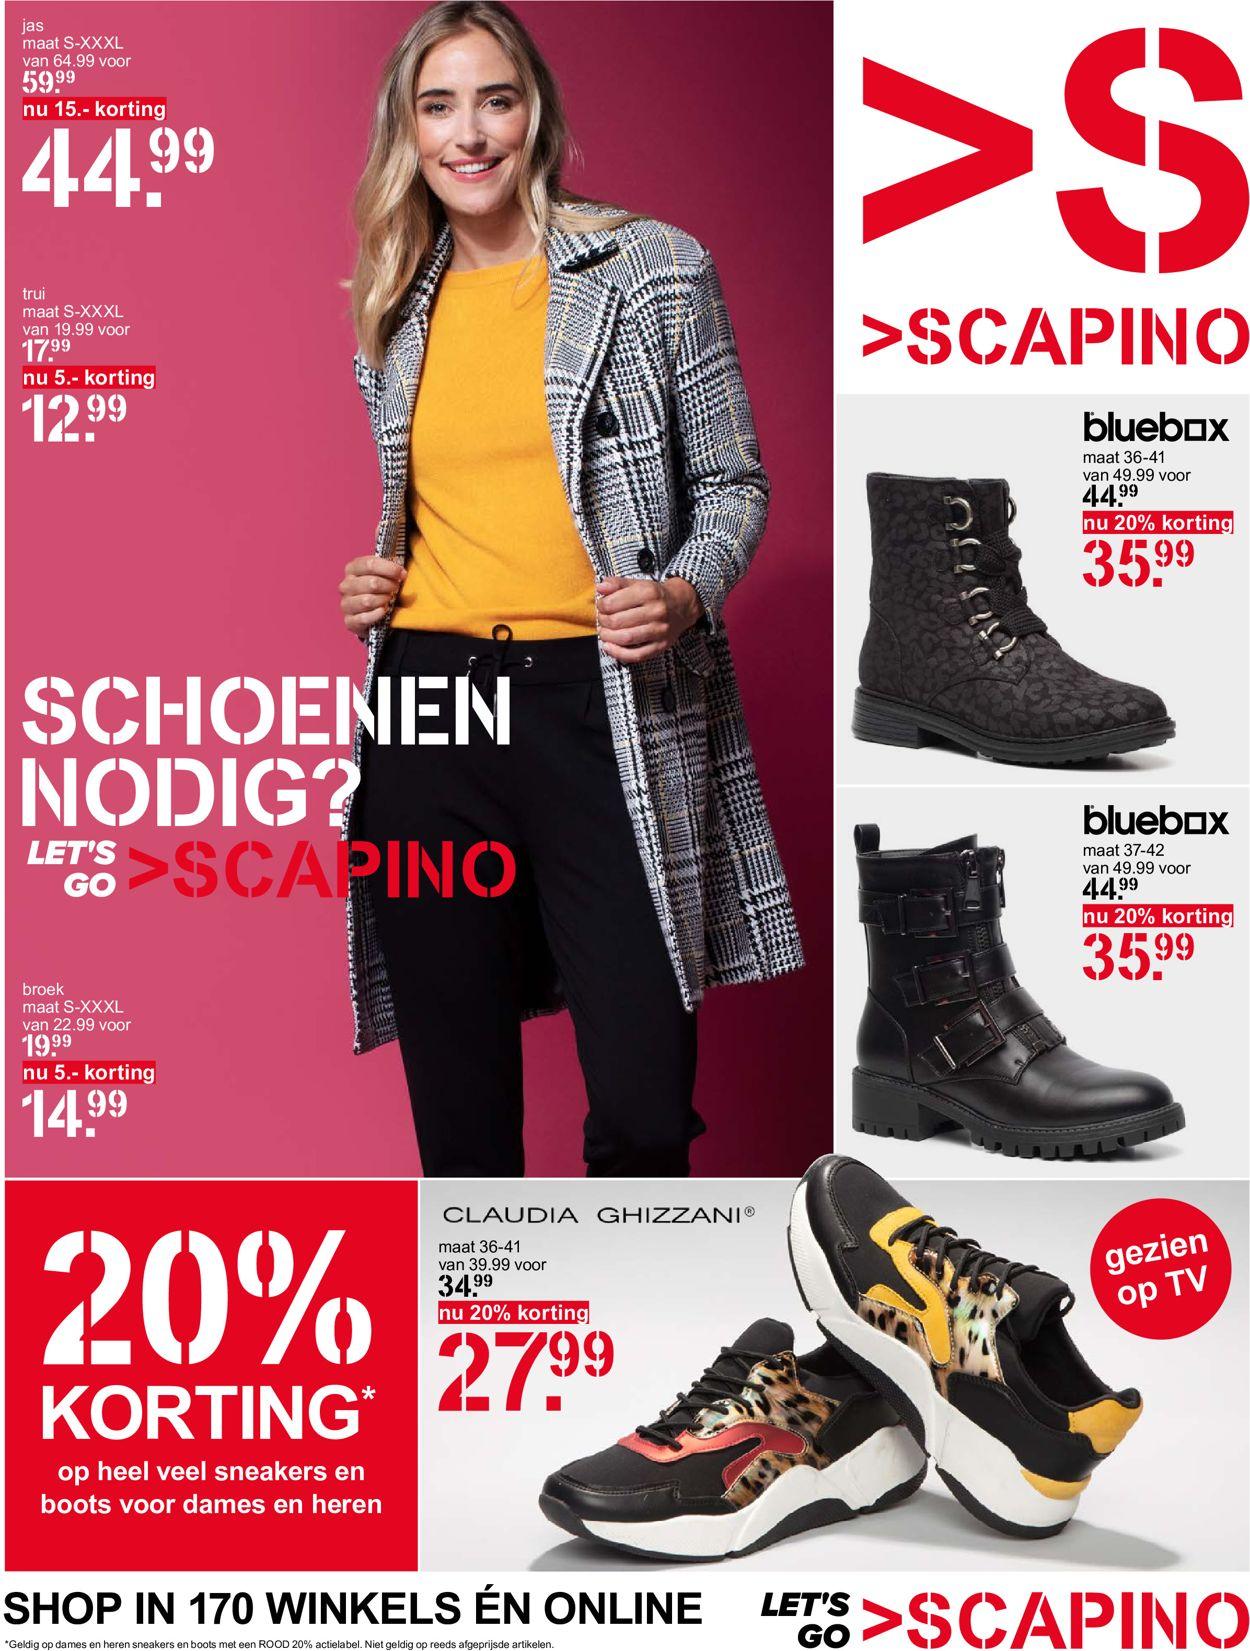 Scapino Folder - 16.09-29.09.2019